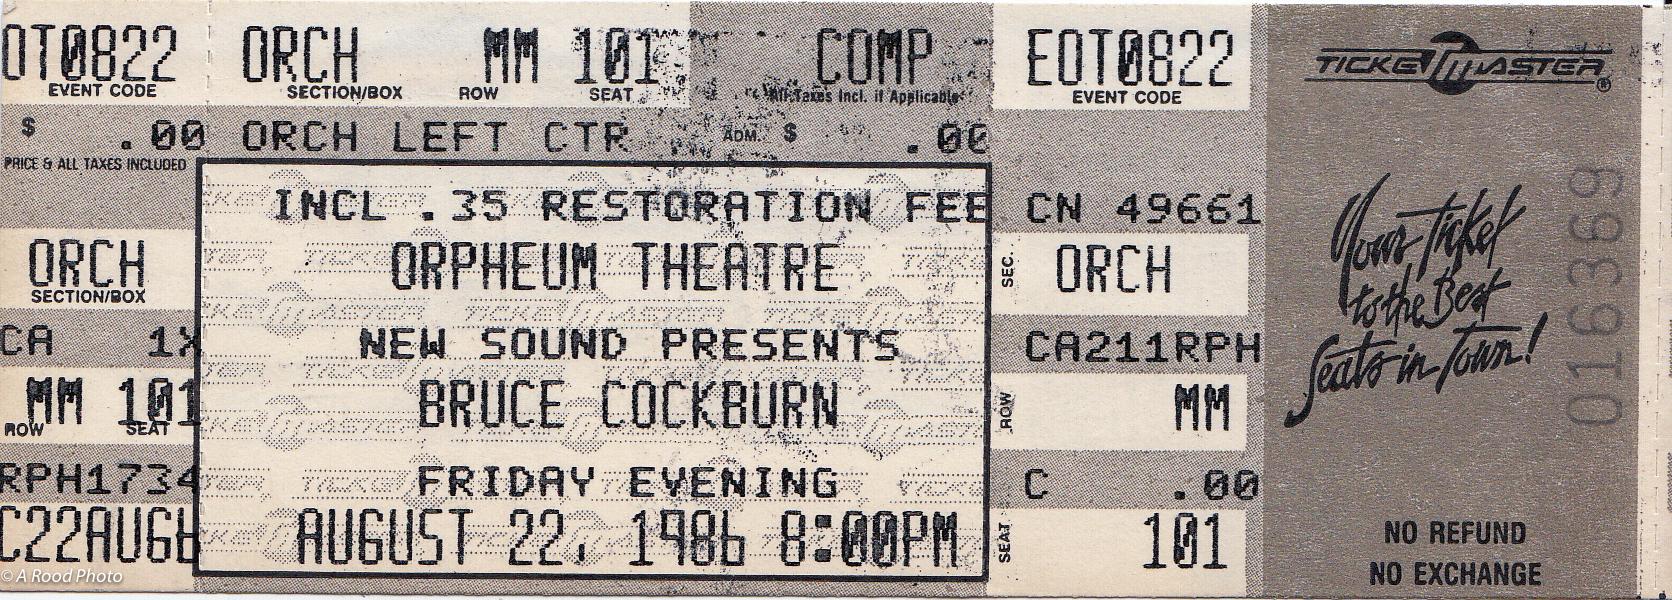 Bruce Cockburn 8-22-1986 ticket.jpg